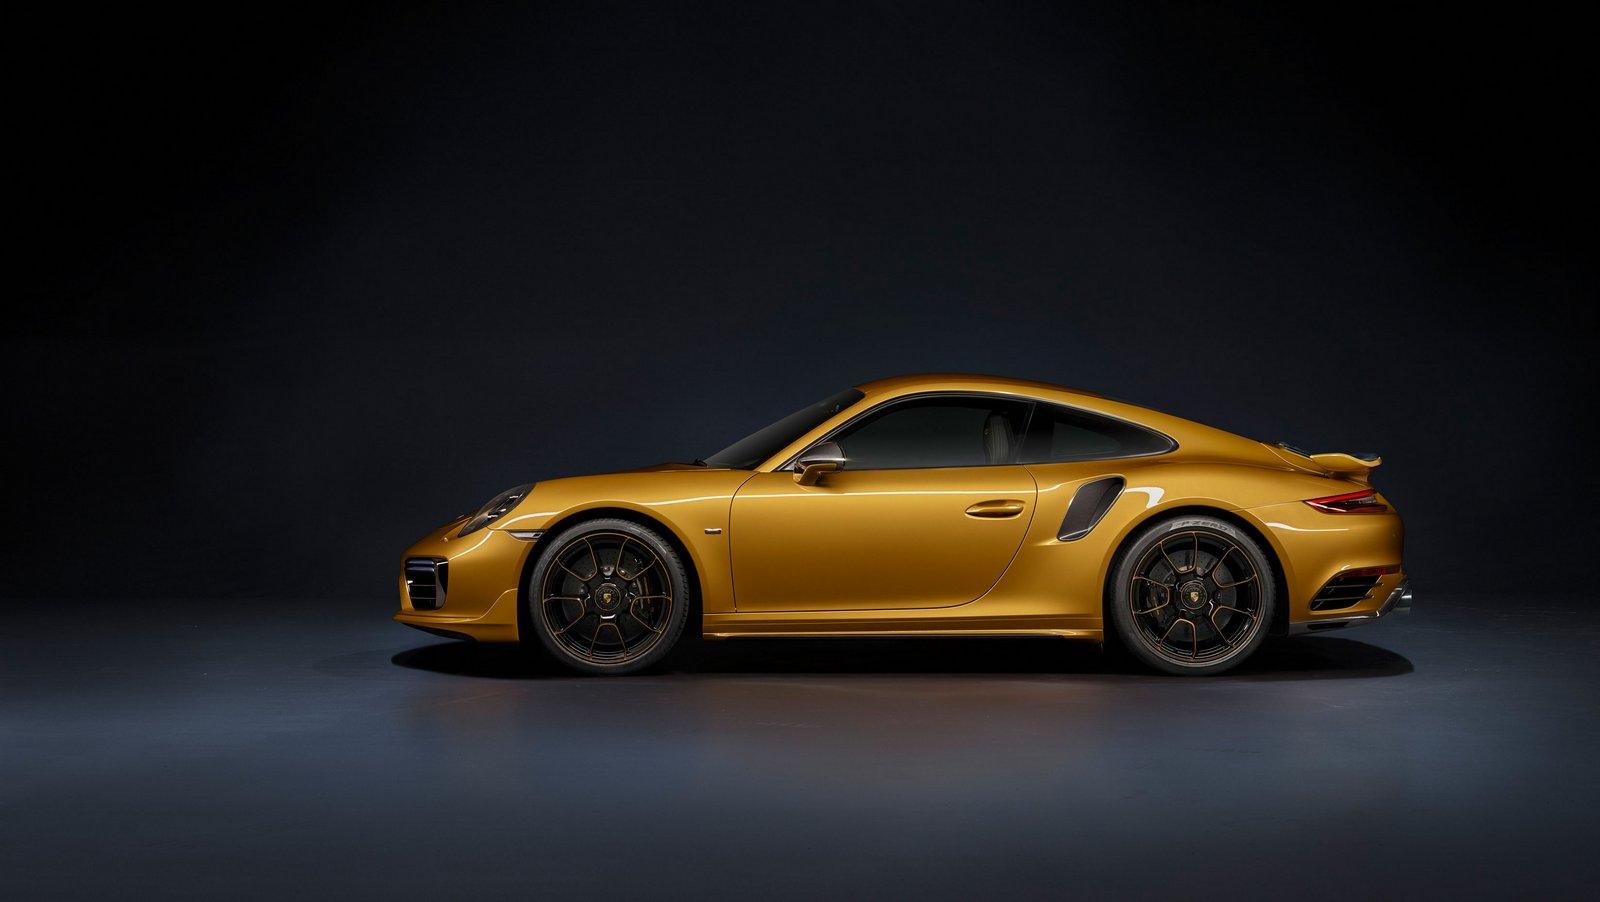 New Porsche 911 Turbo S Exclusive Series Gets An